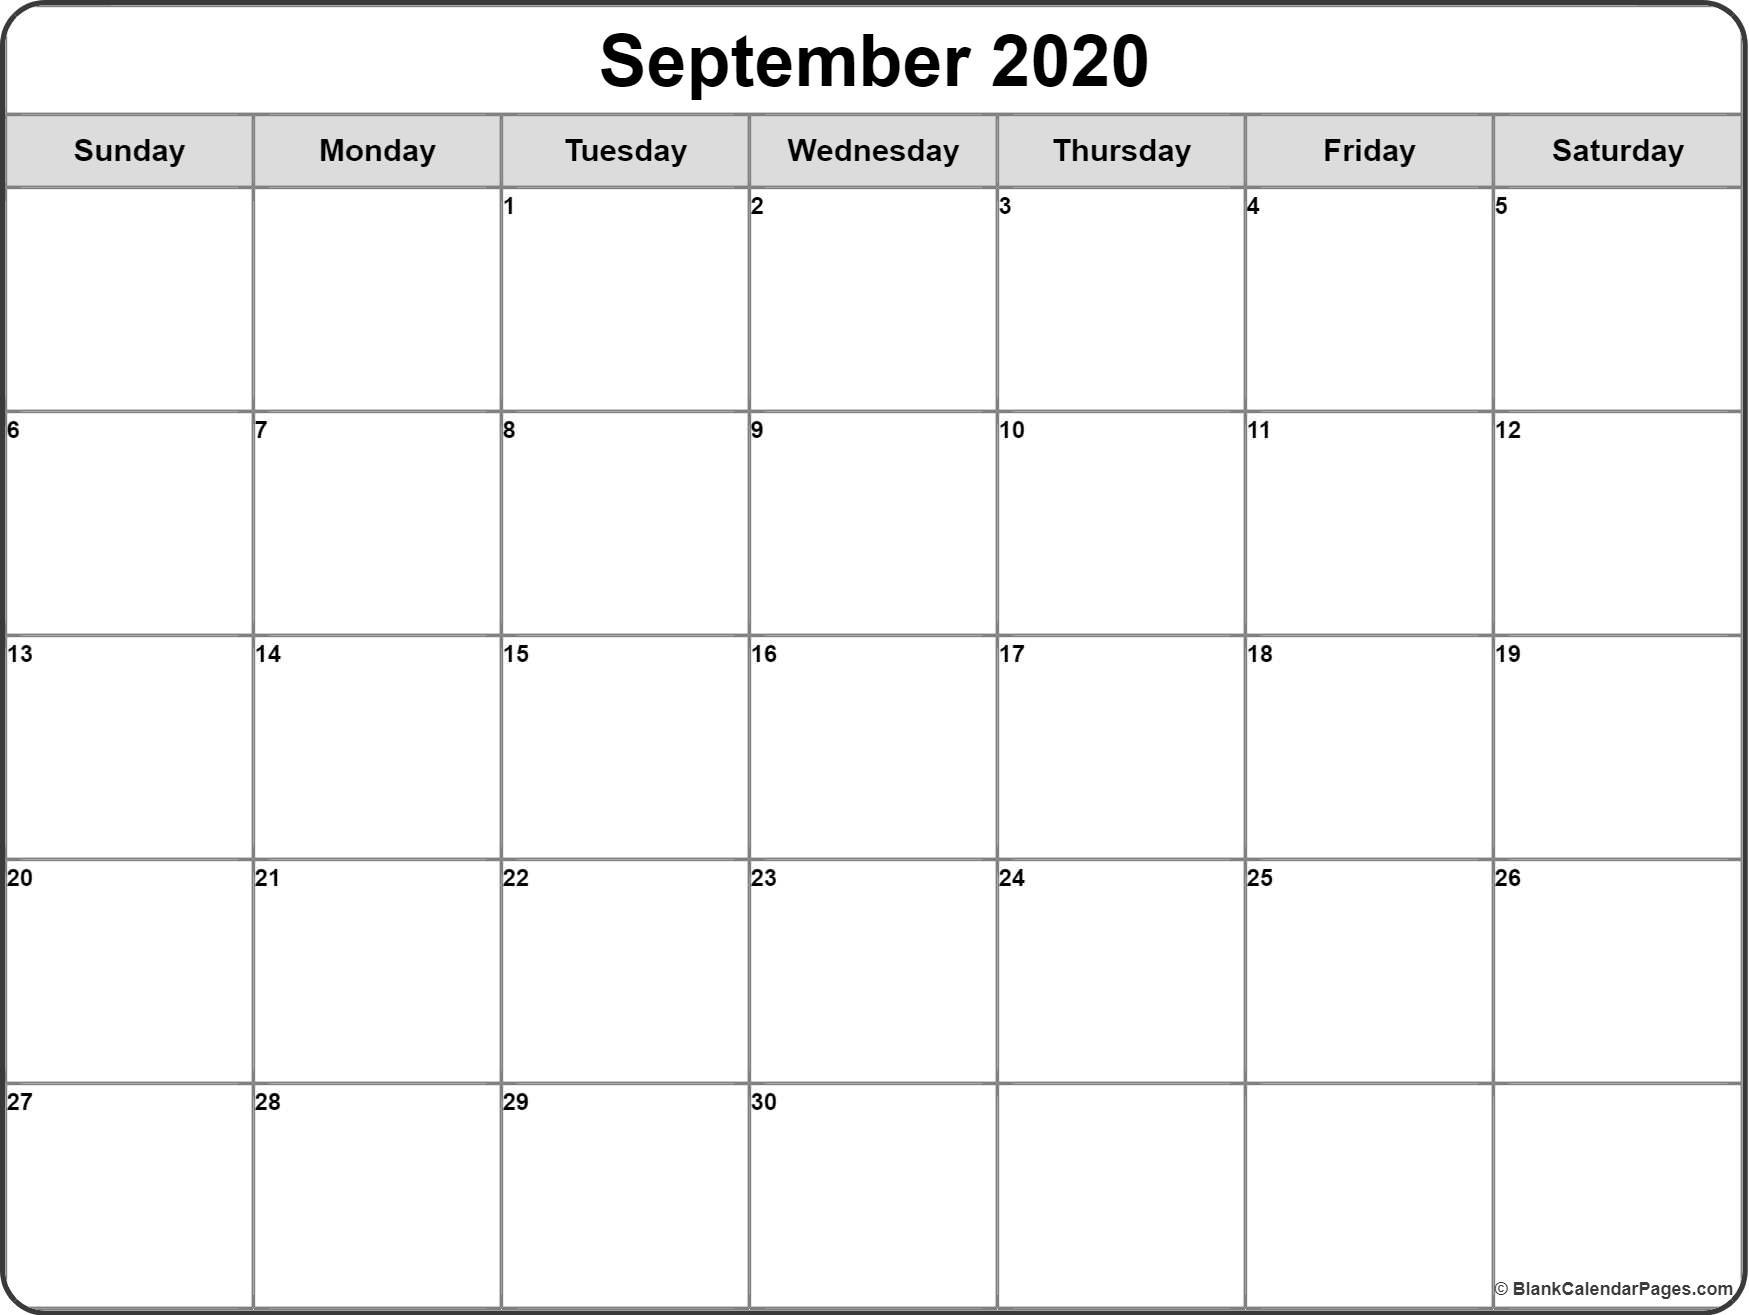 September 2020 Calendar | Free Printable Monthly Calendars inside Printable Fill In Calendar By Month